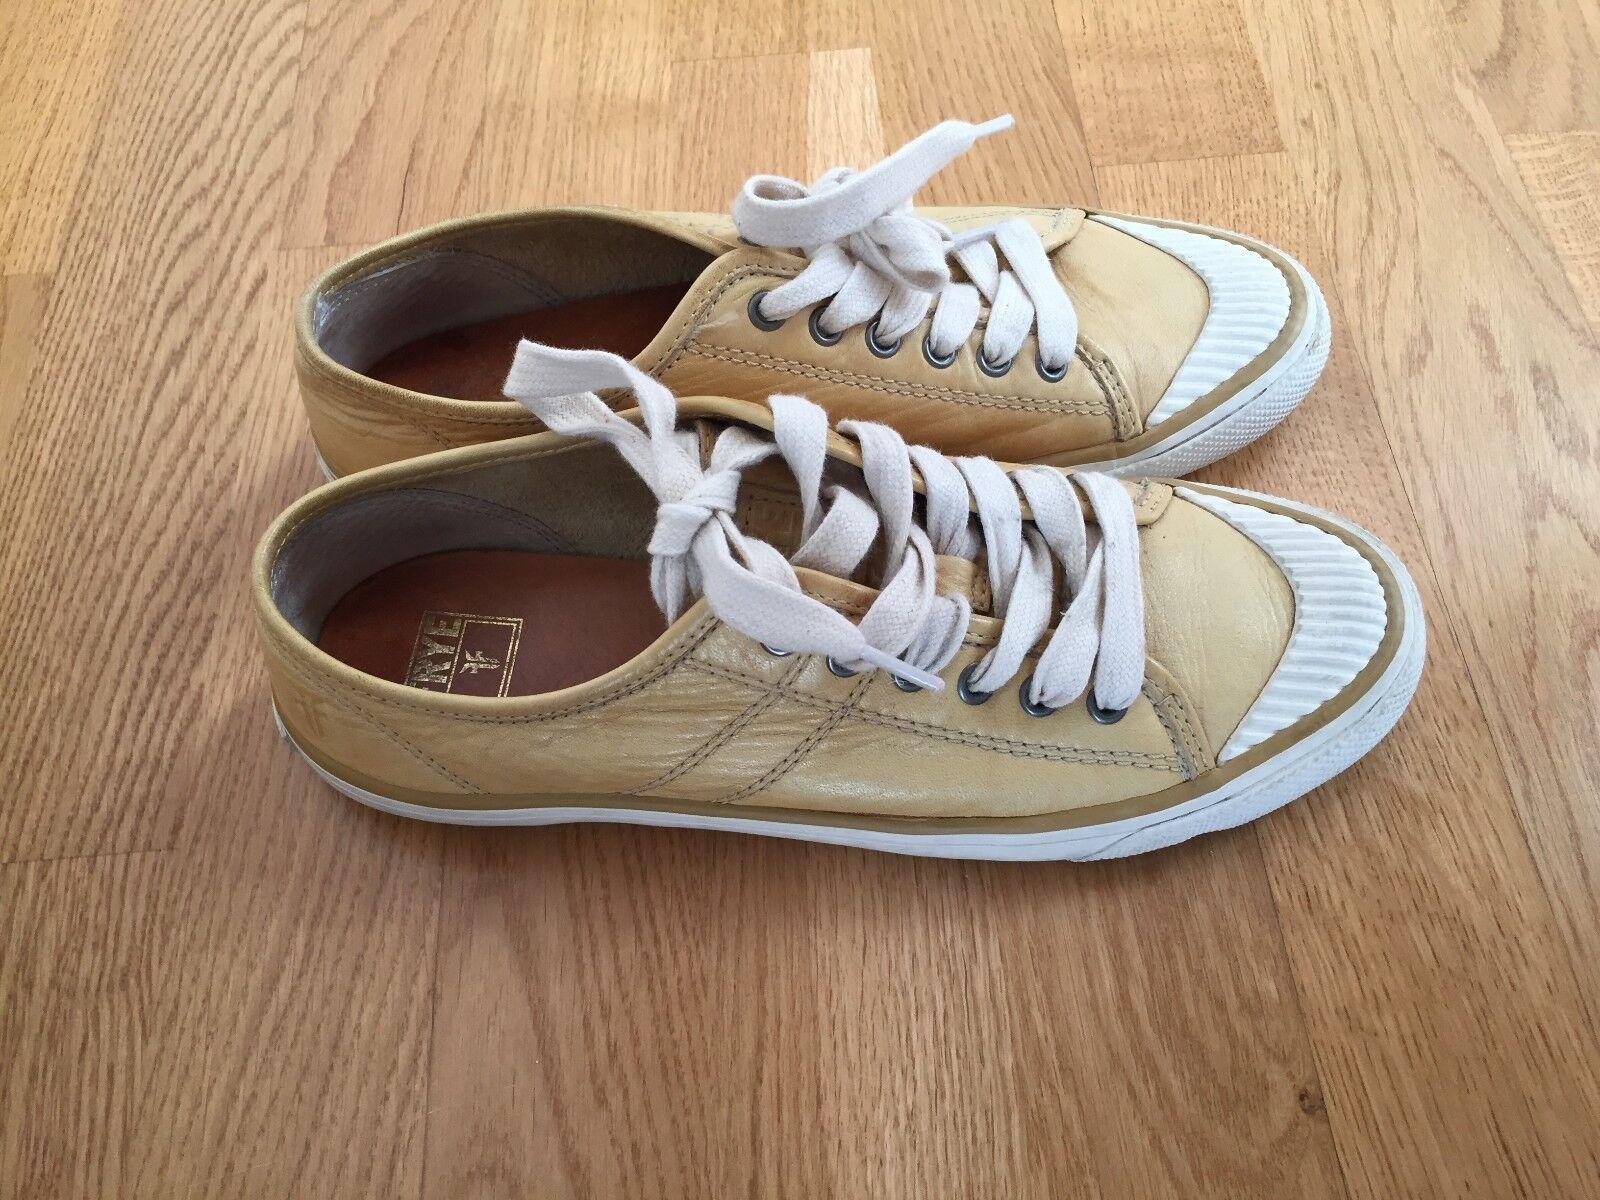 Frye Betty Low Lace Banana Scarpe shoes da Ginnastica / Flat shoes Scarpe Size 7 Yellow / Mustard 38911d